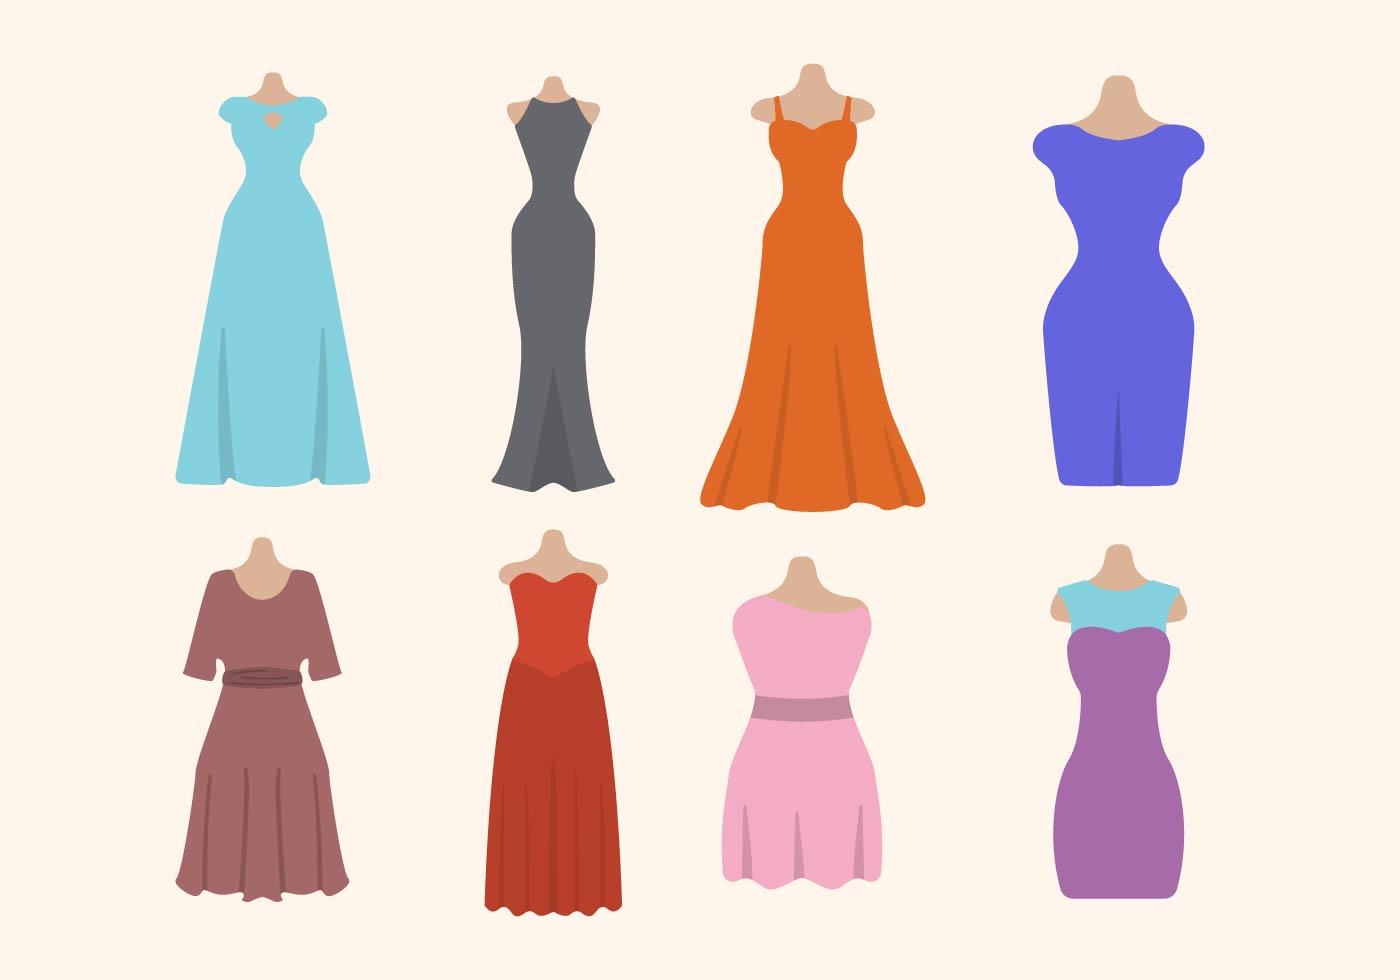 dress free vector art 6602 free downloads